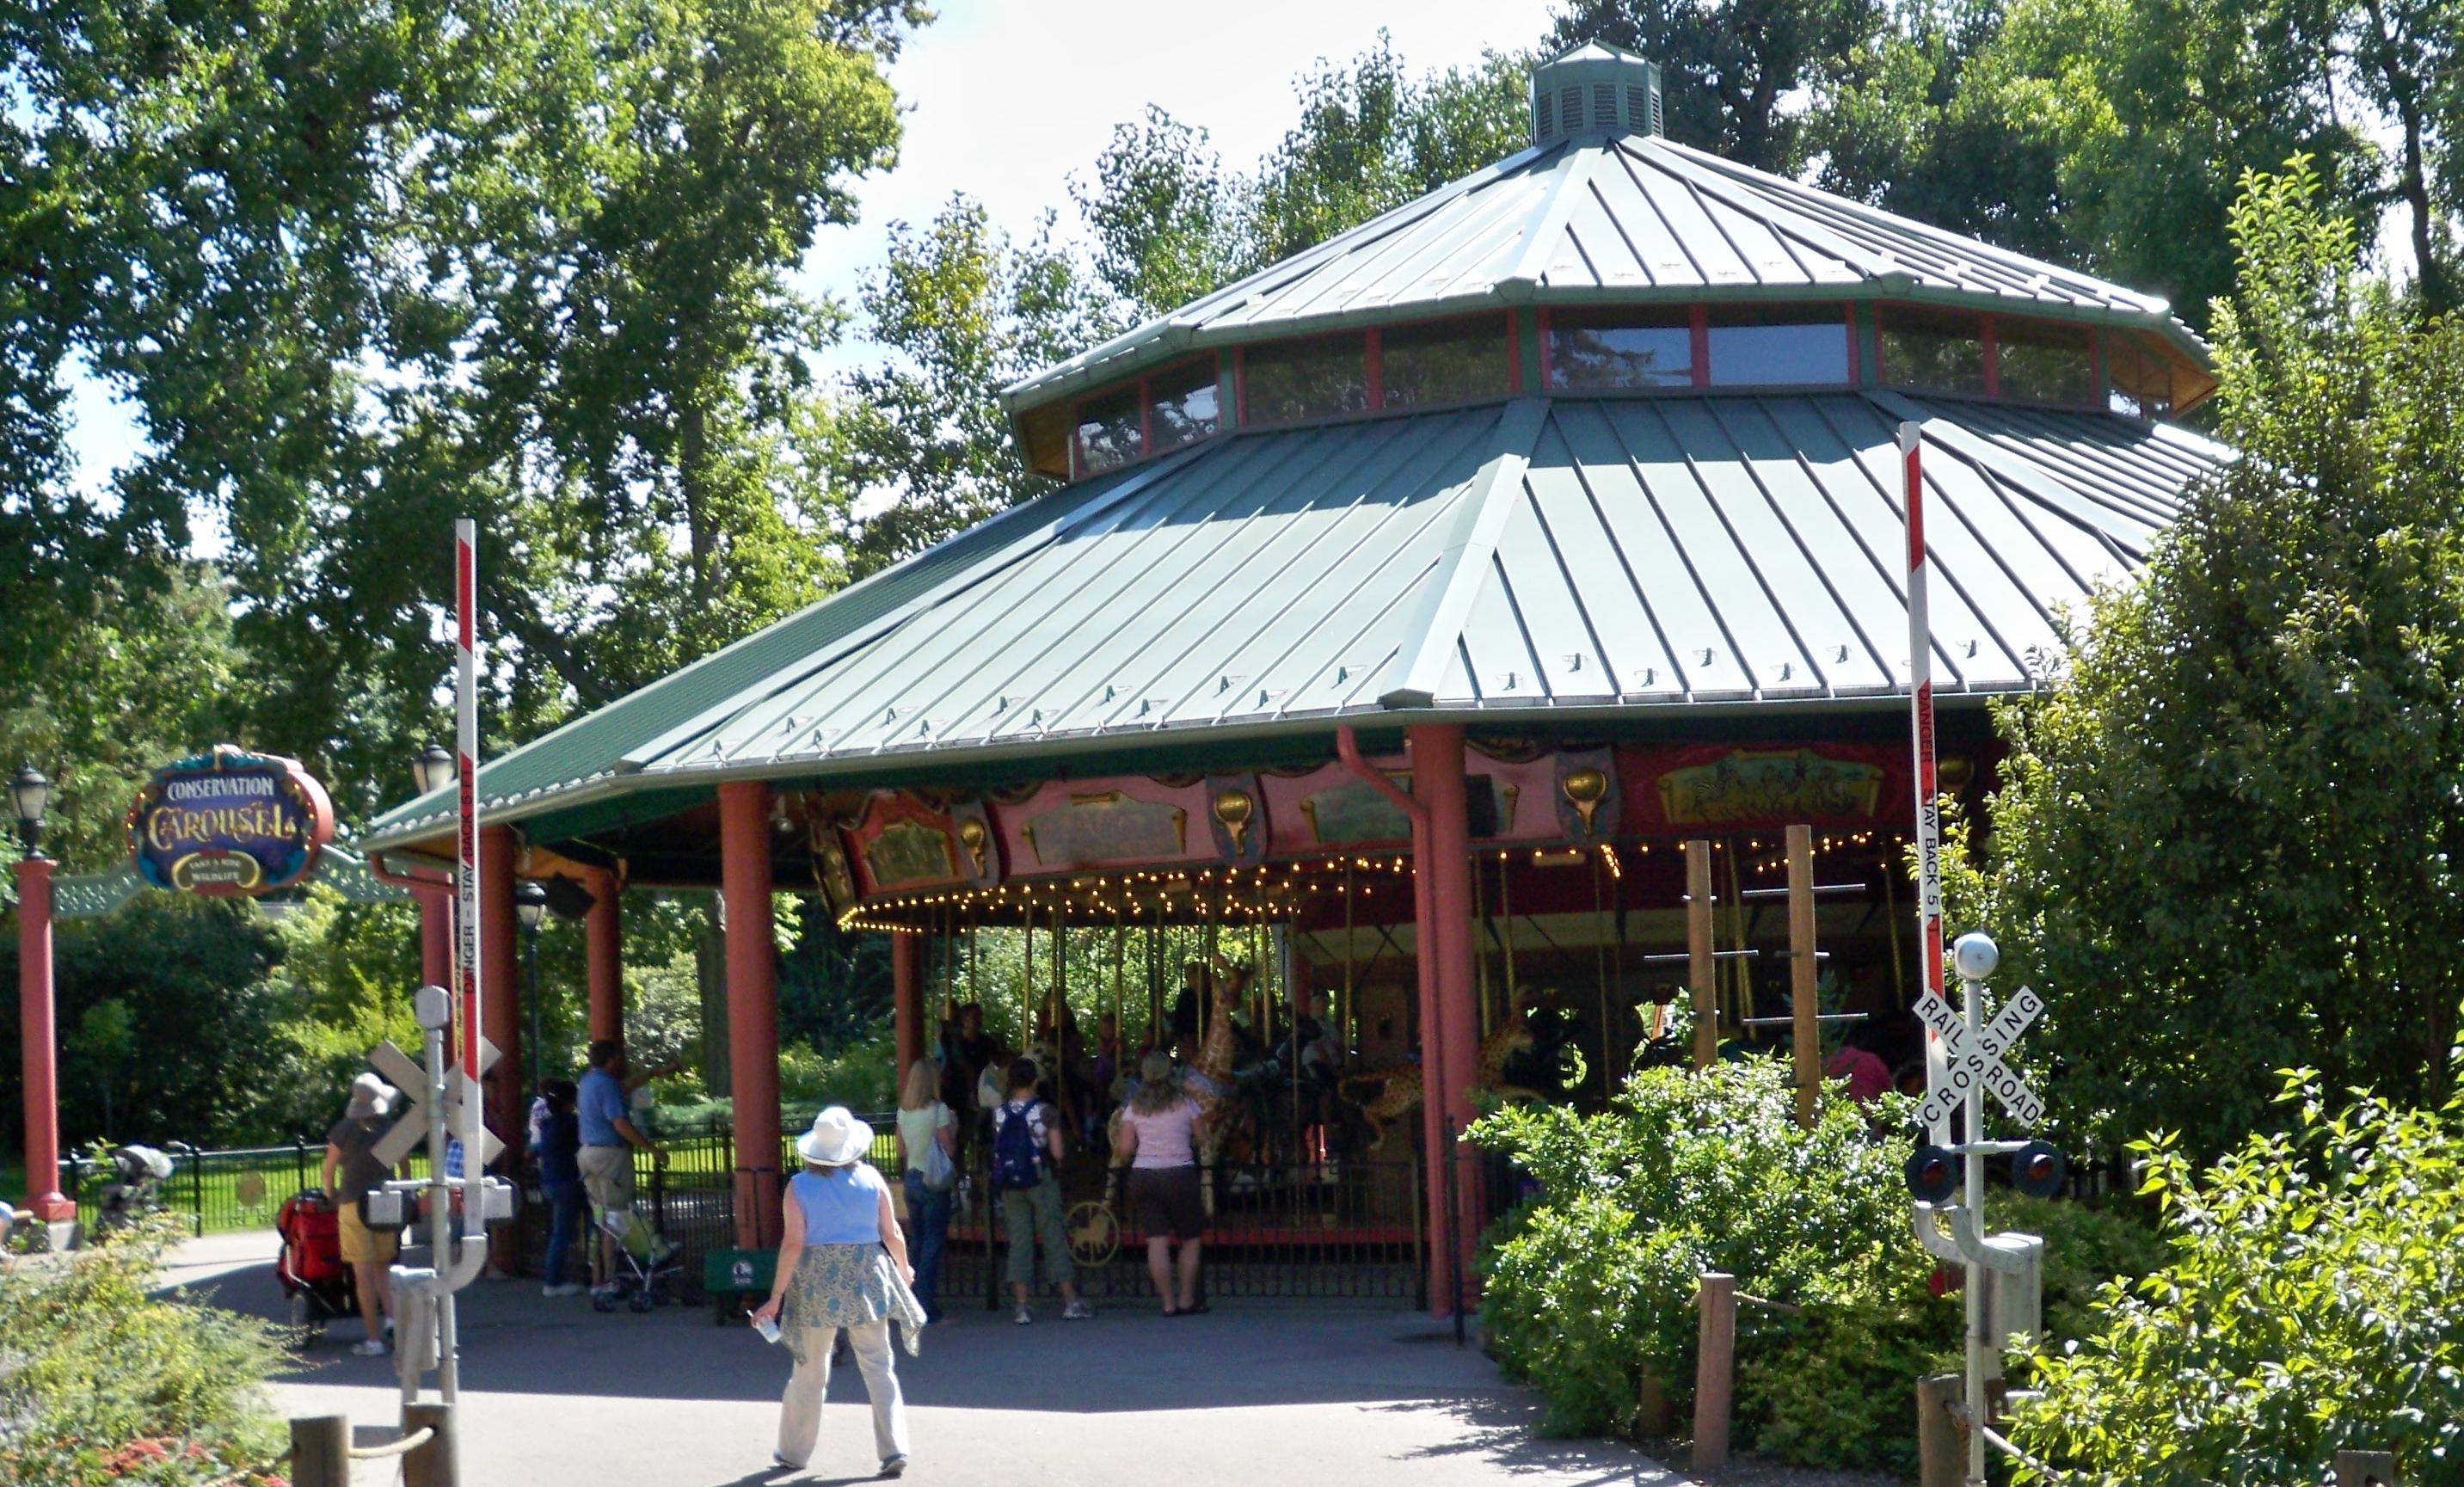 National carousel association denver zoo carousel african wild dog - Endangered Species Carousel